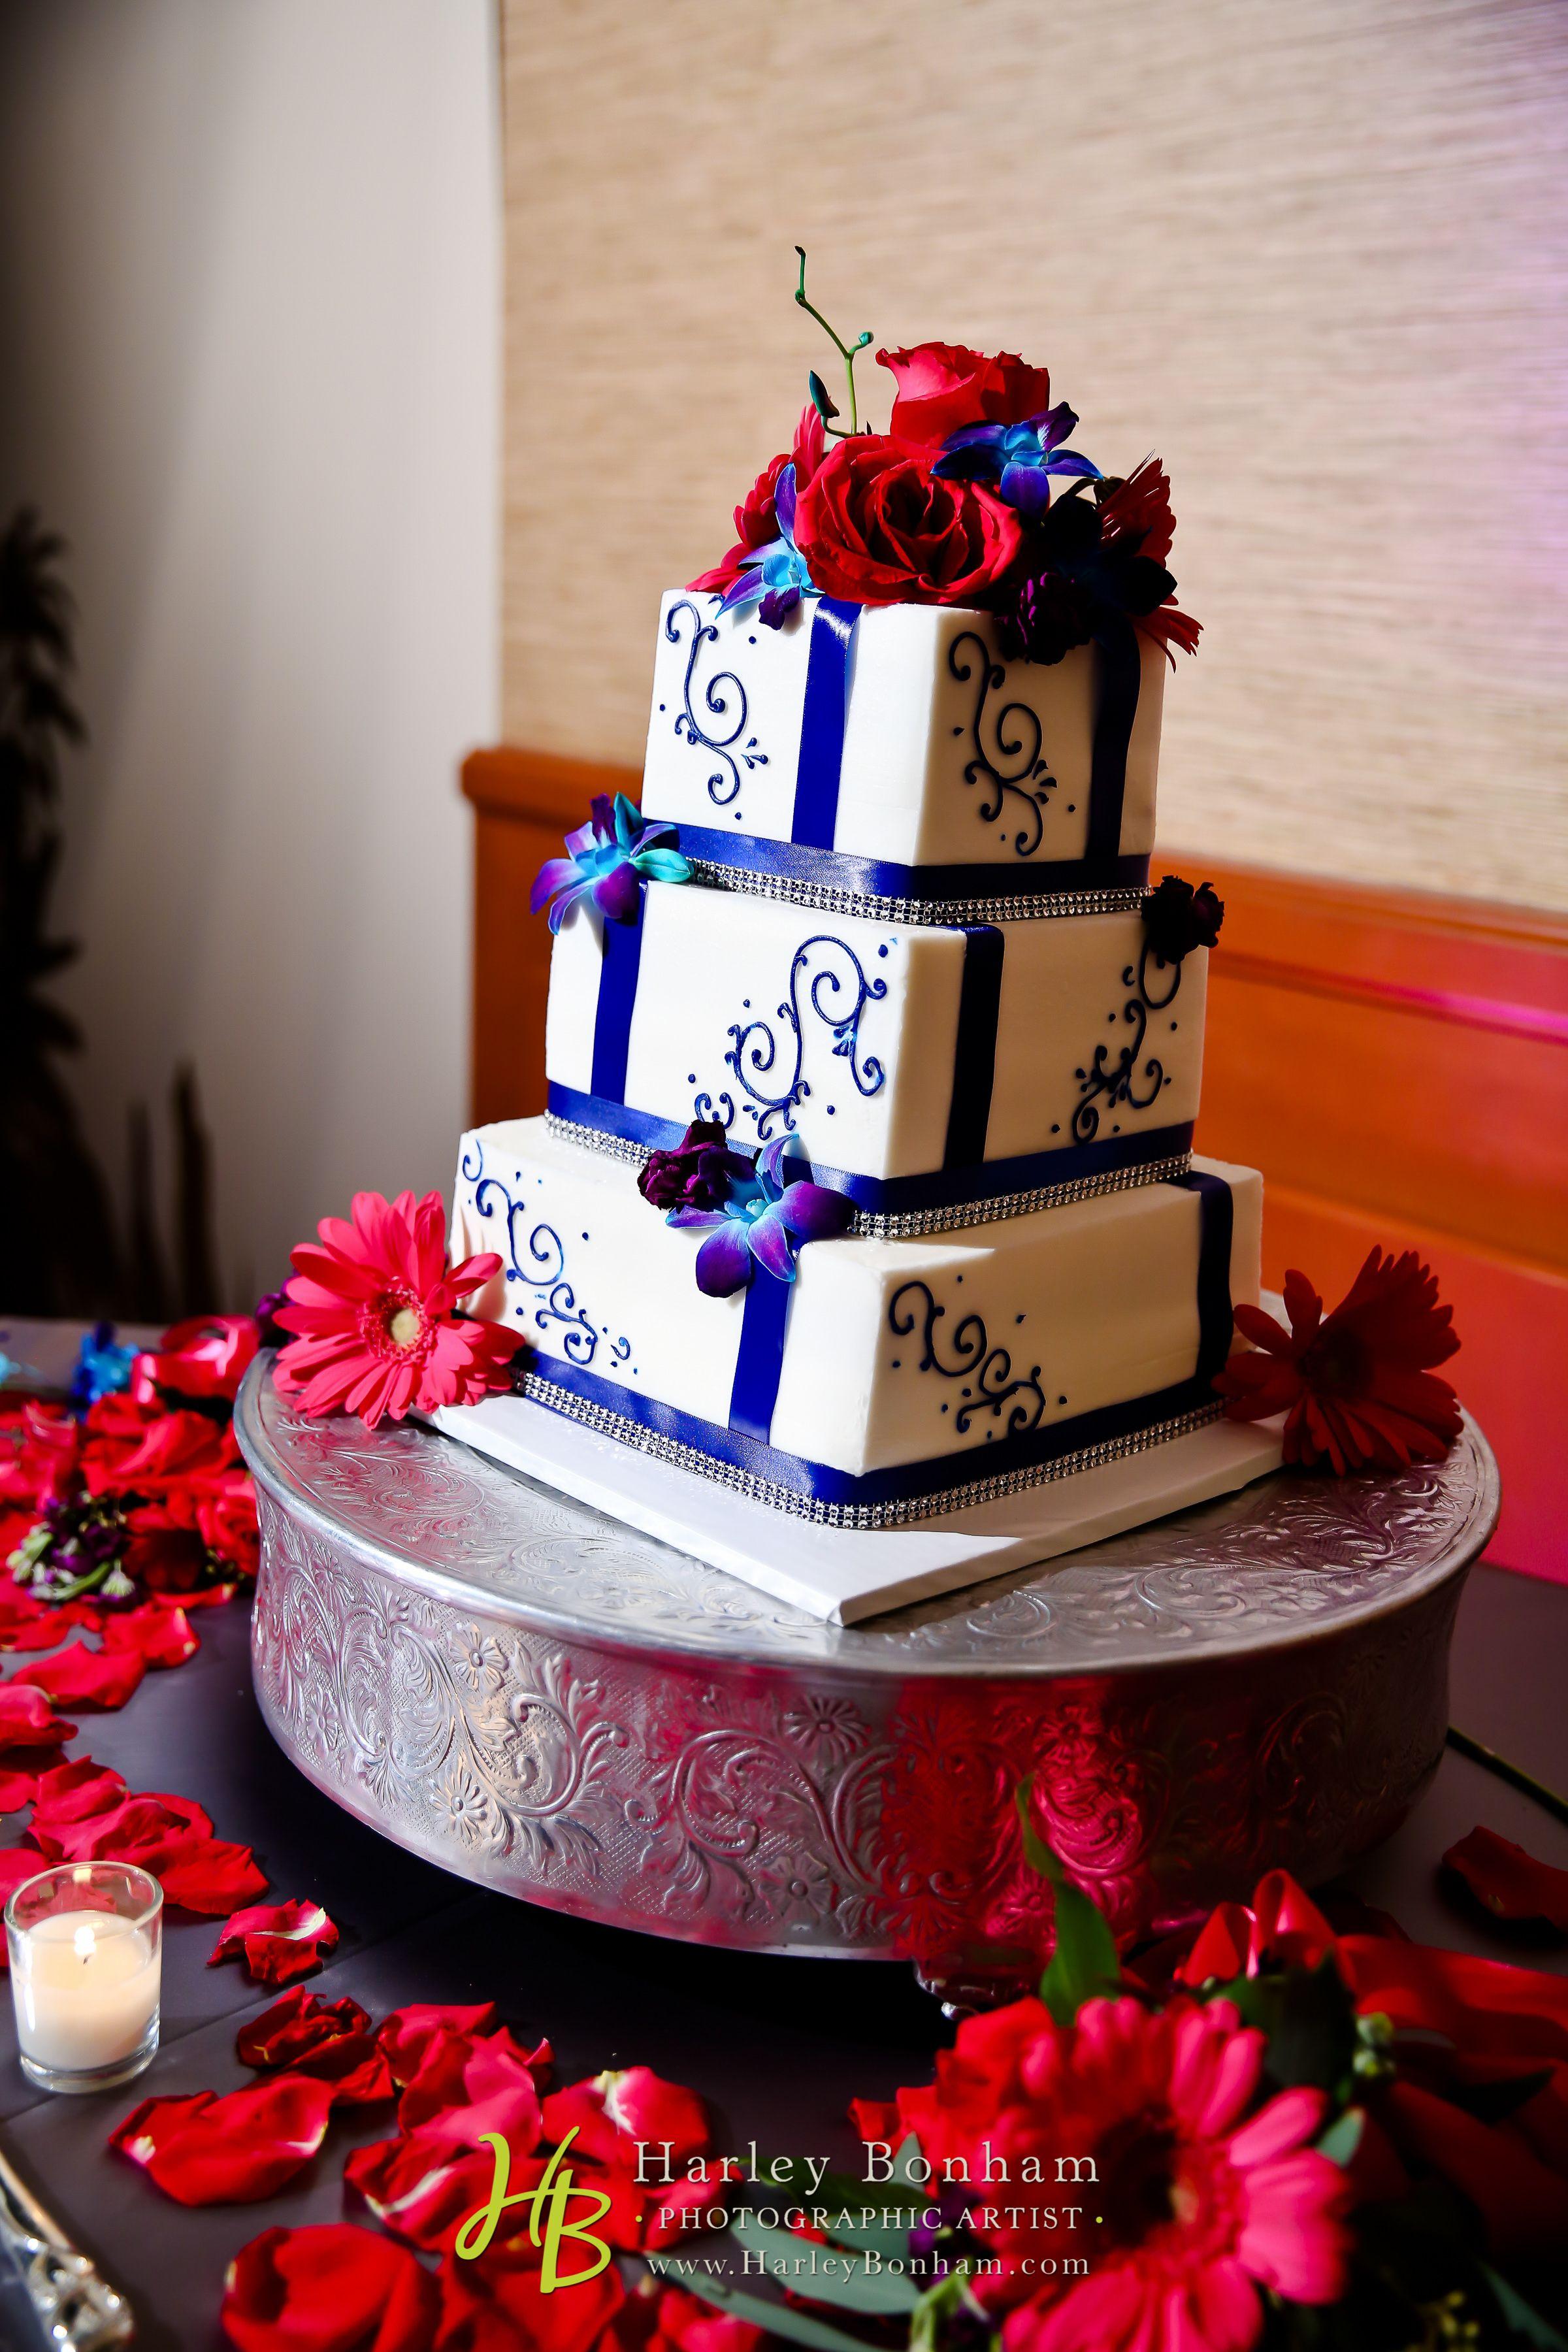 Trilogy at vistanciaus kiva club weddings arizona wedding venue